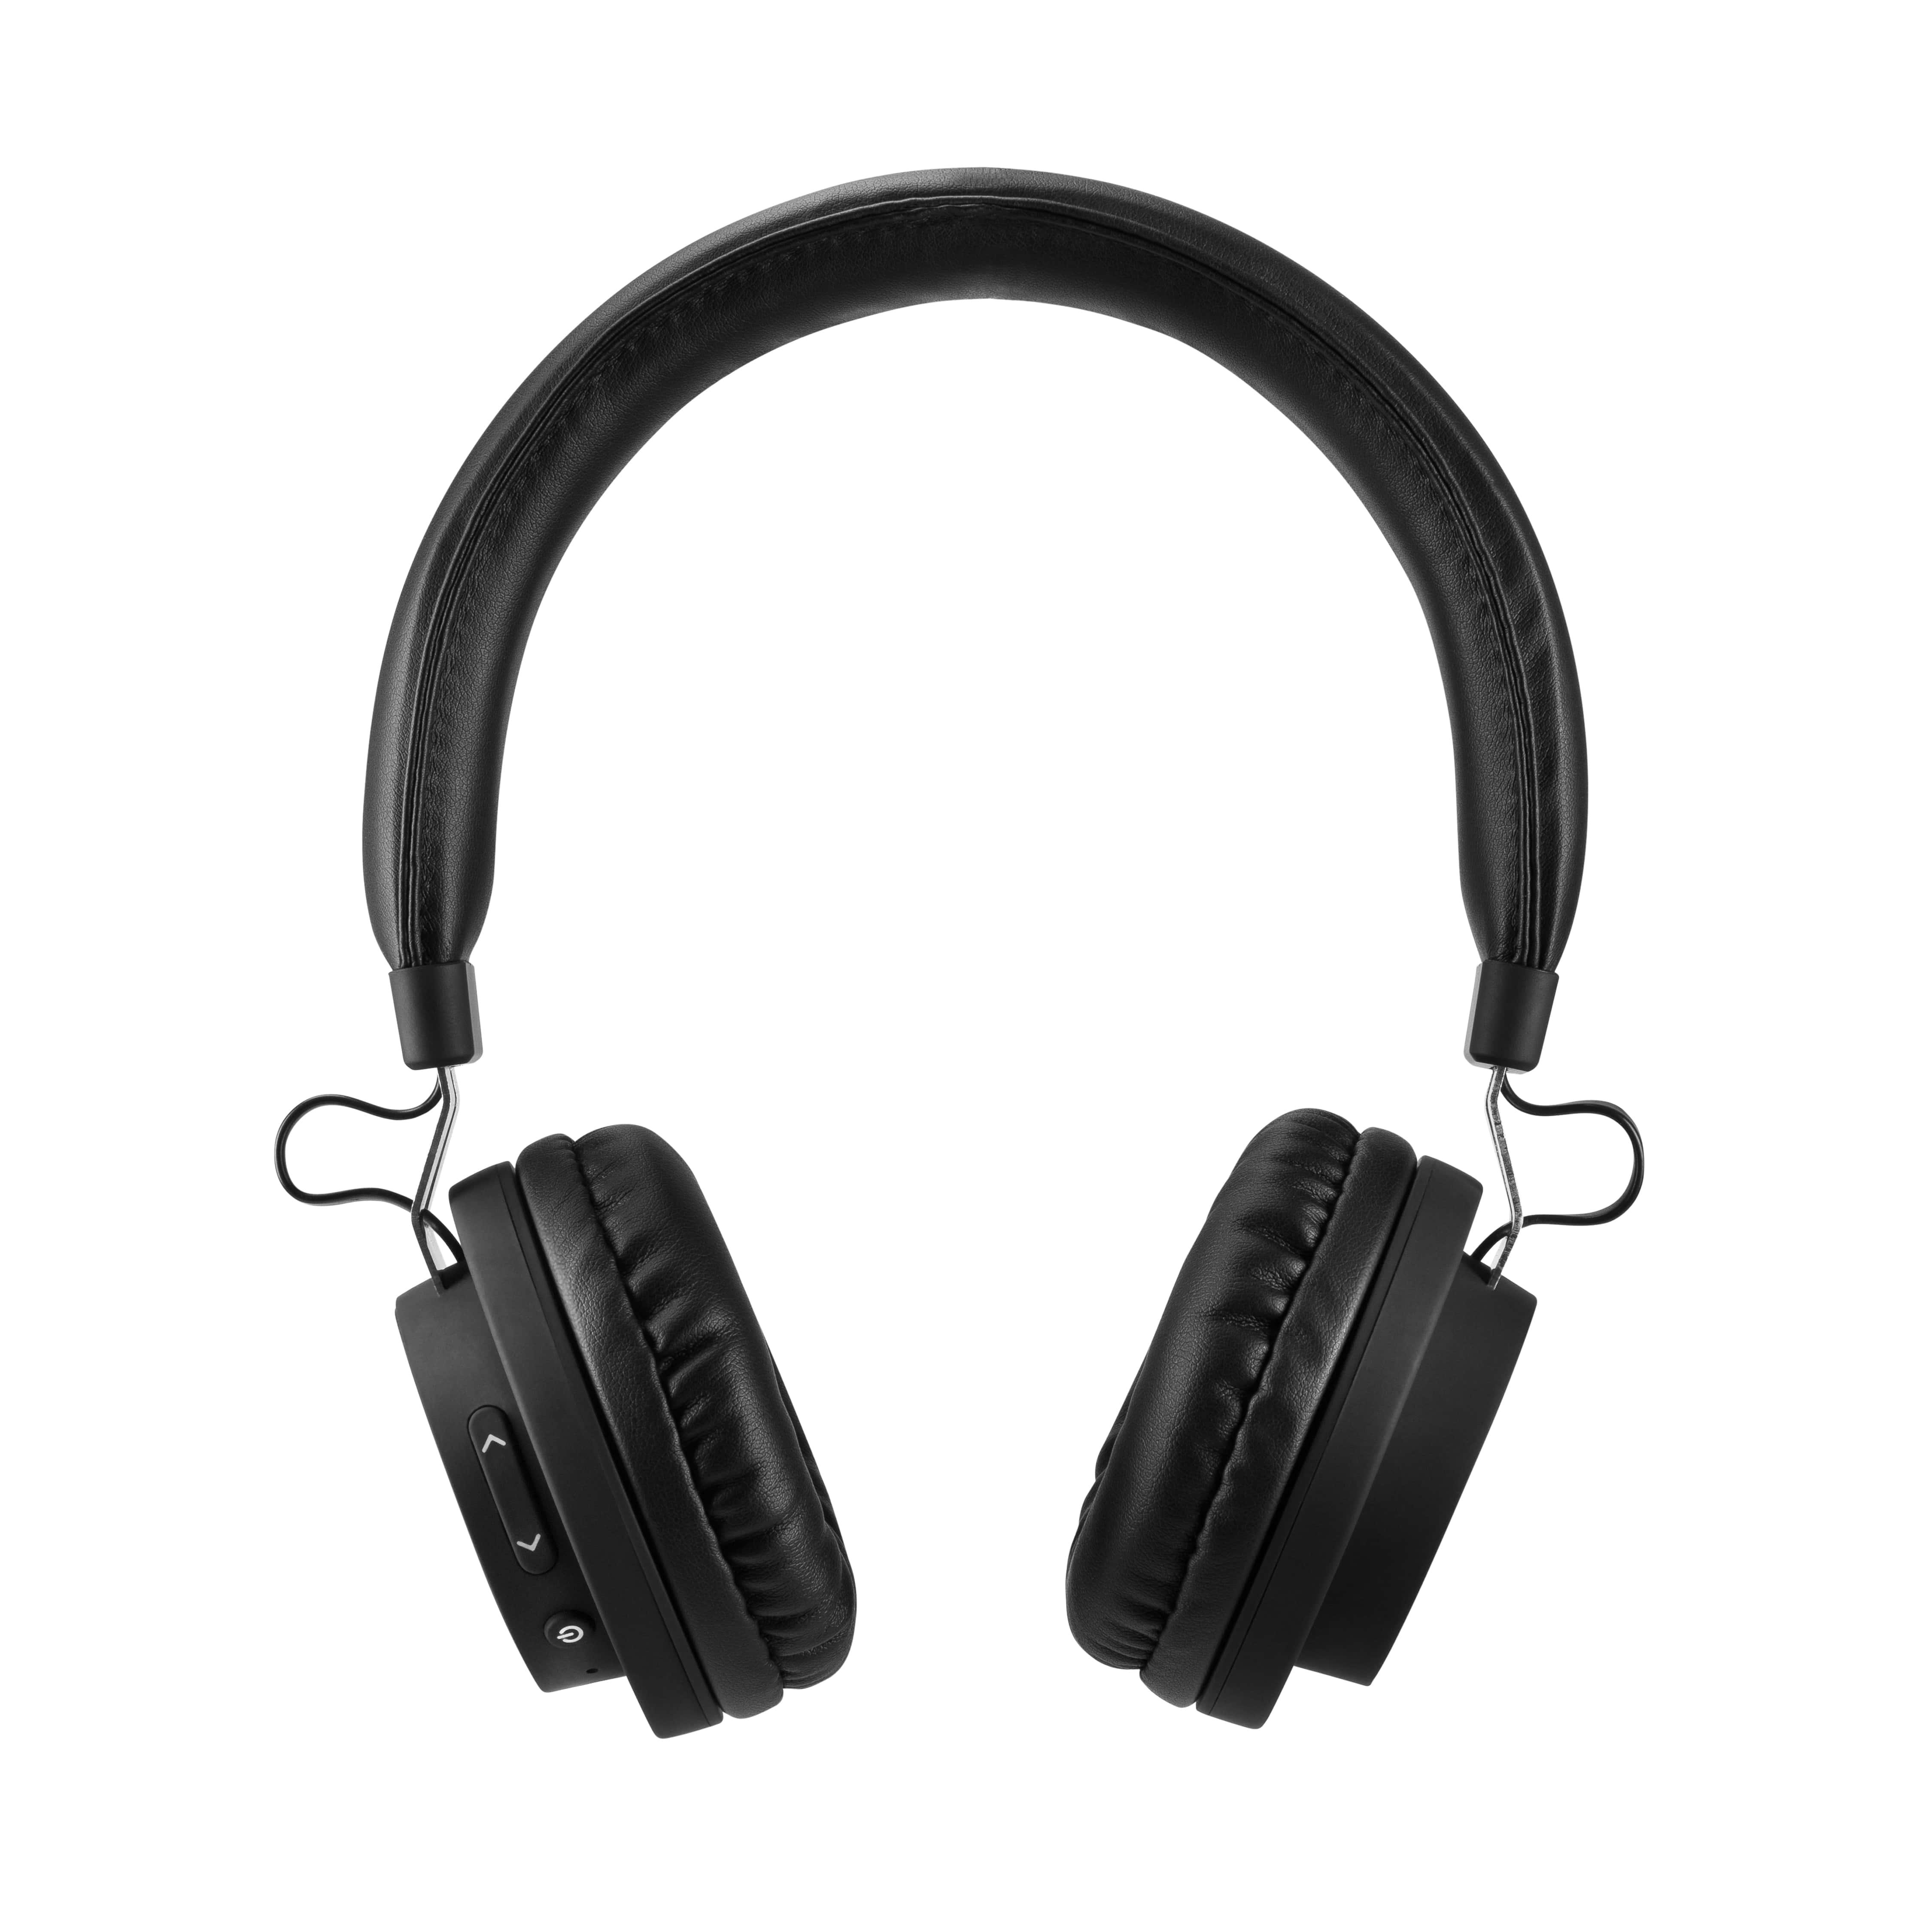 ACME BH203 On Ear Kopfhörer spielt Weihnachtssongs via BT